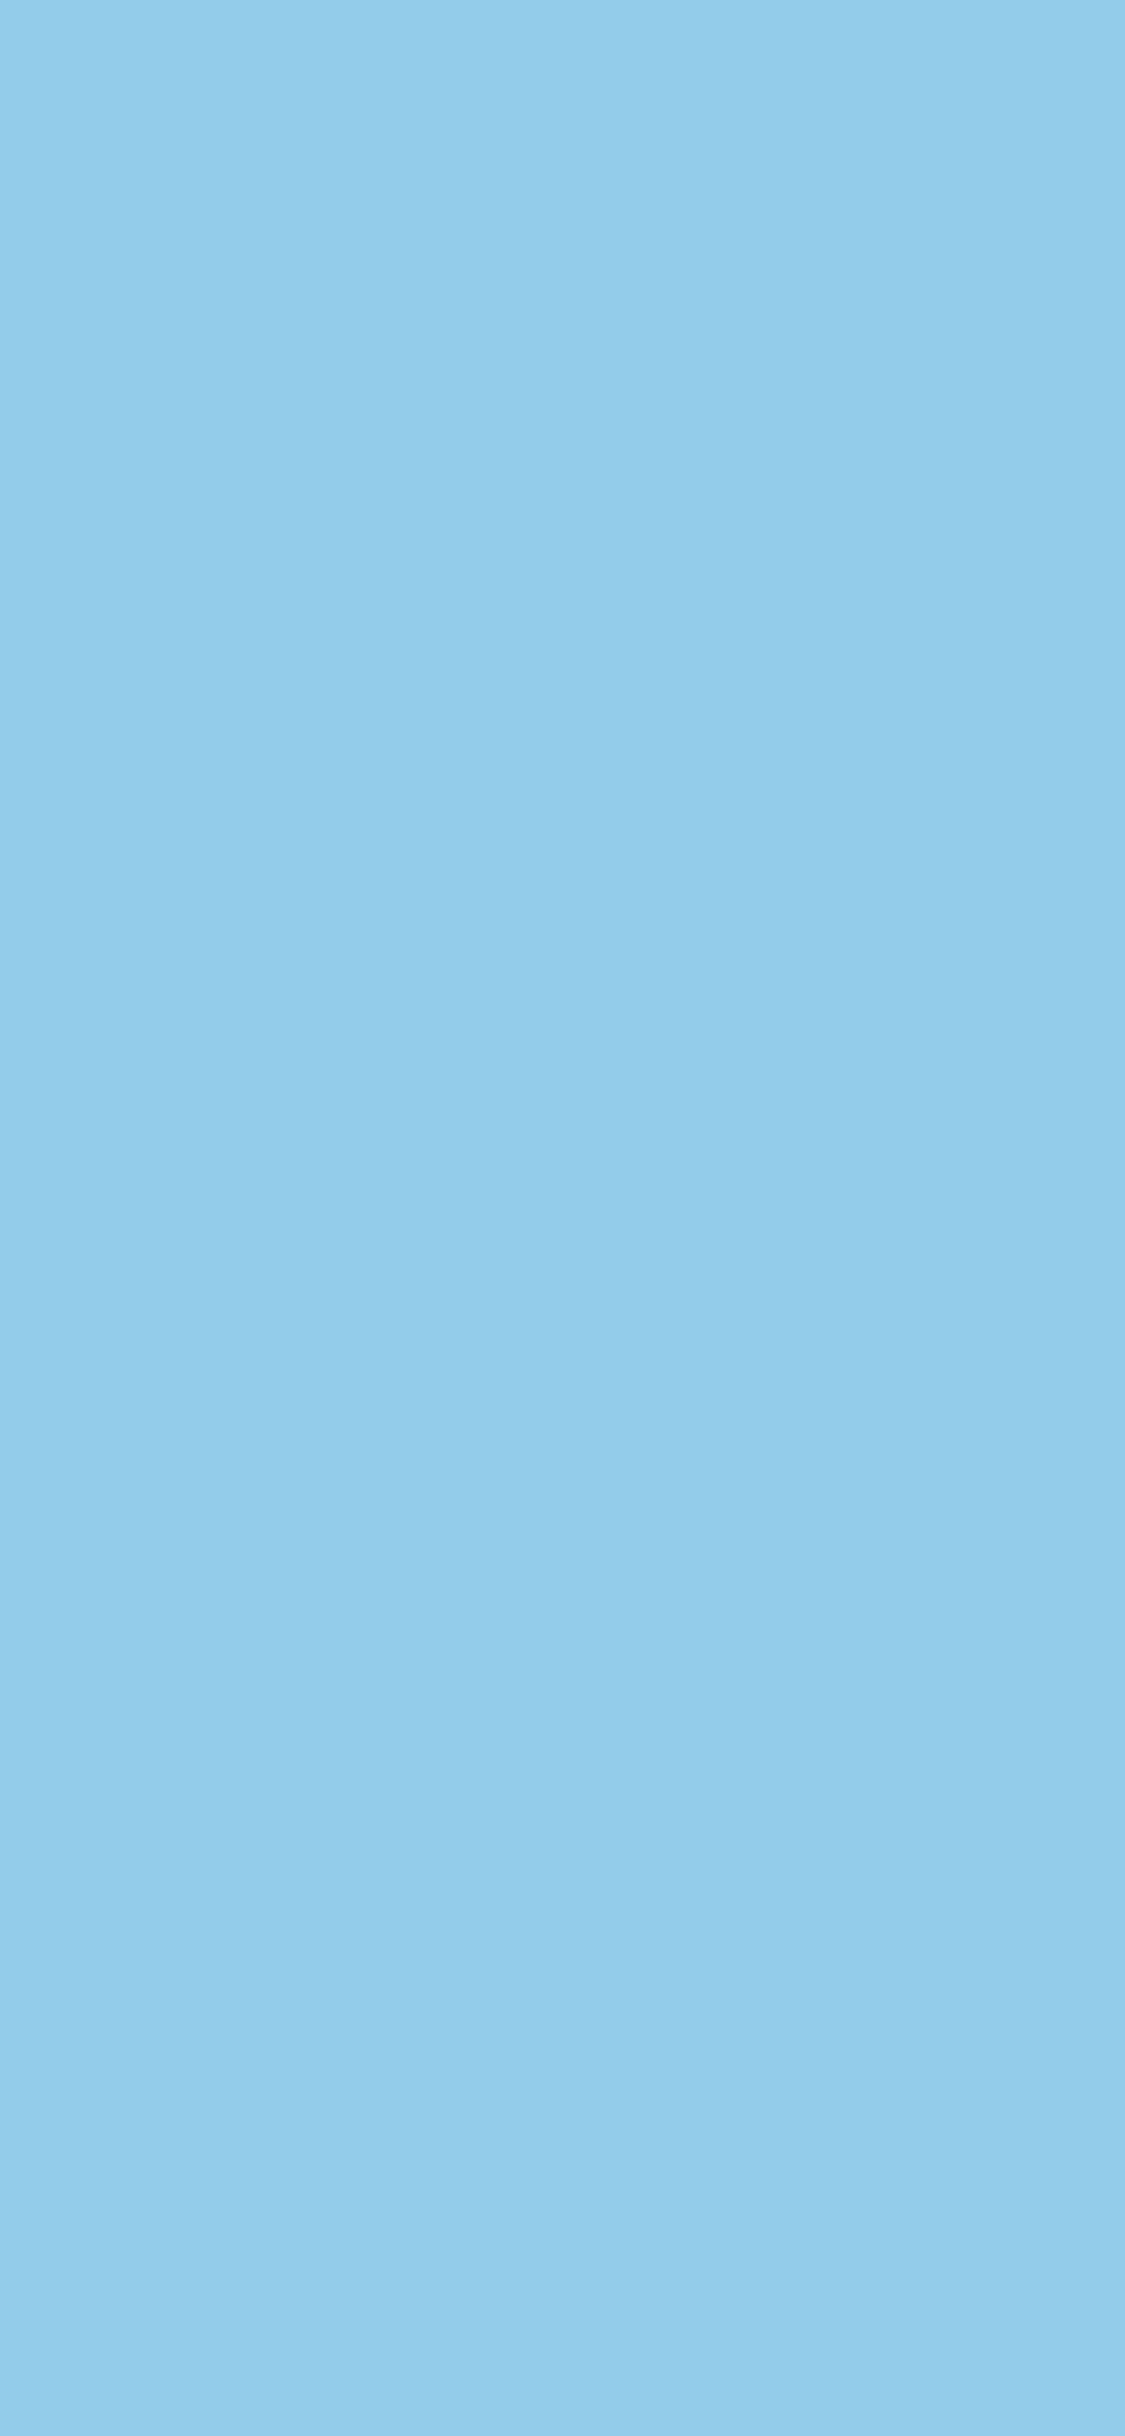 1125x2436 Light Cornflower Blue Solid Color Background